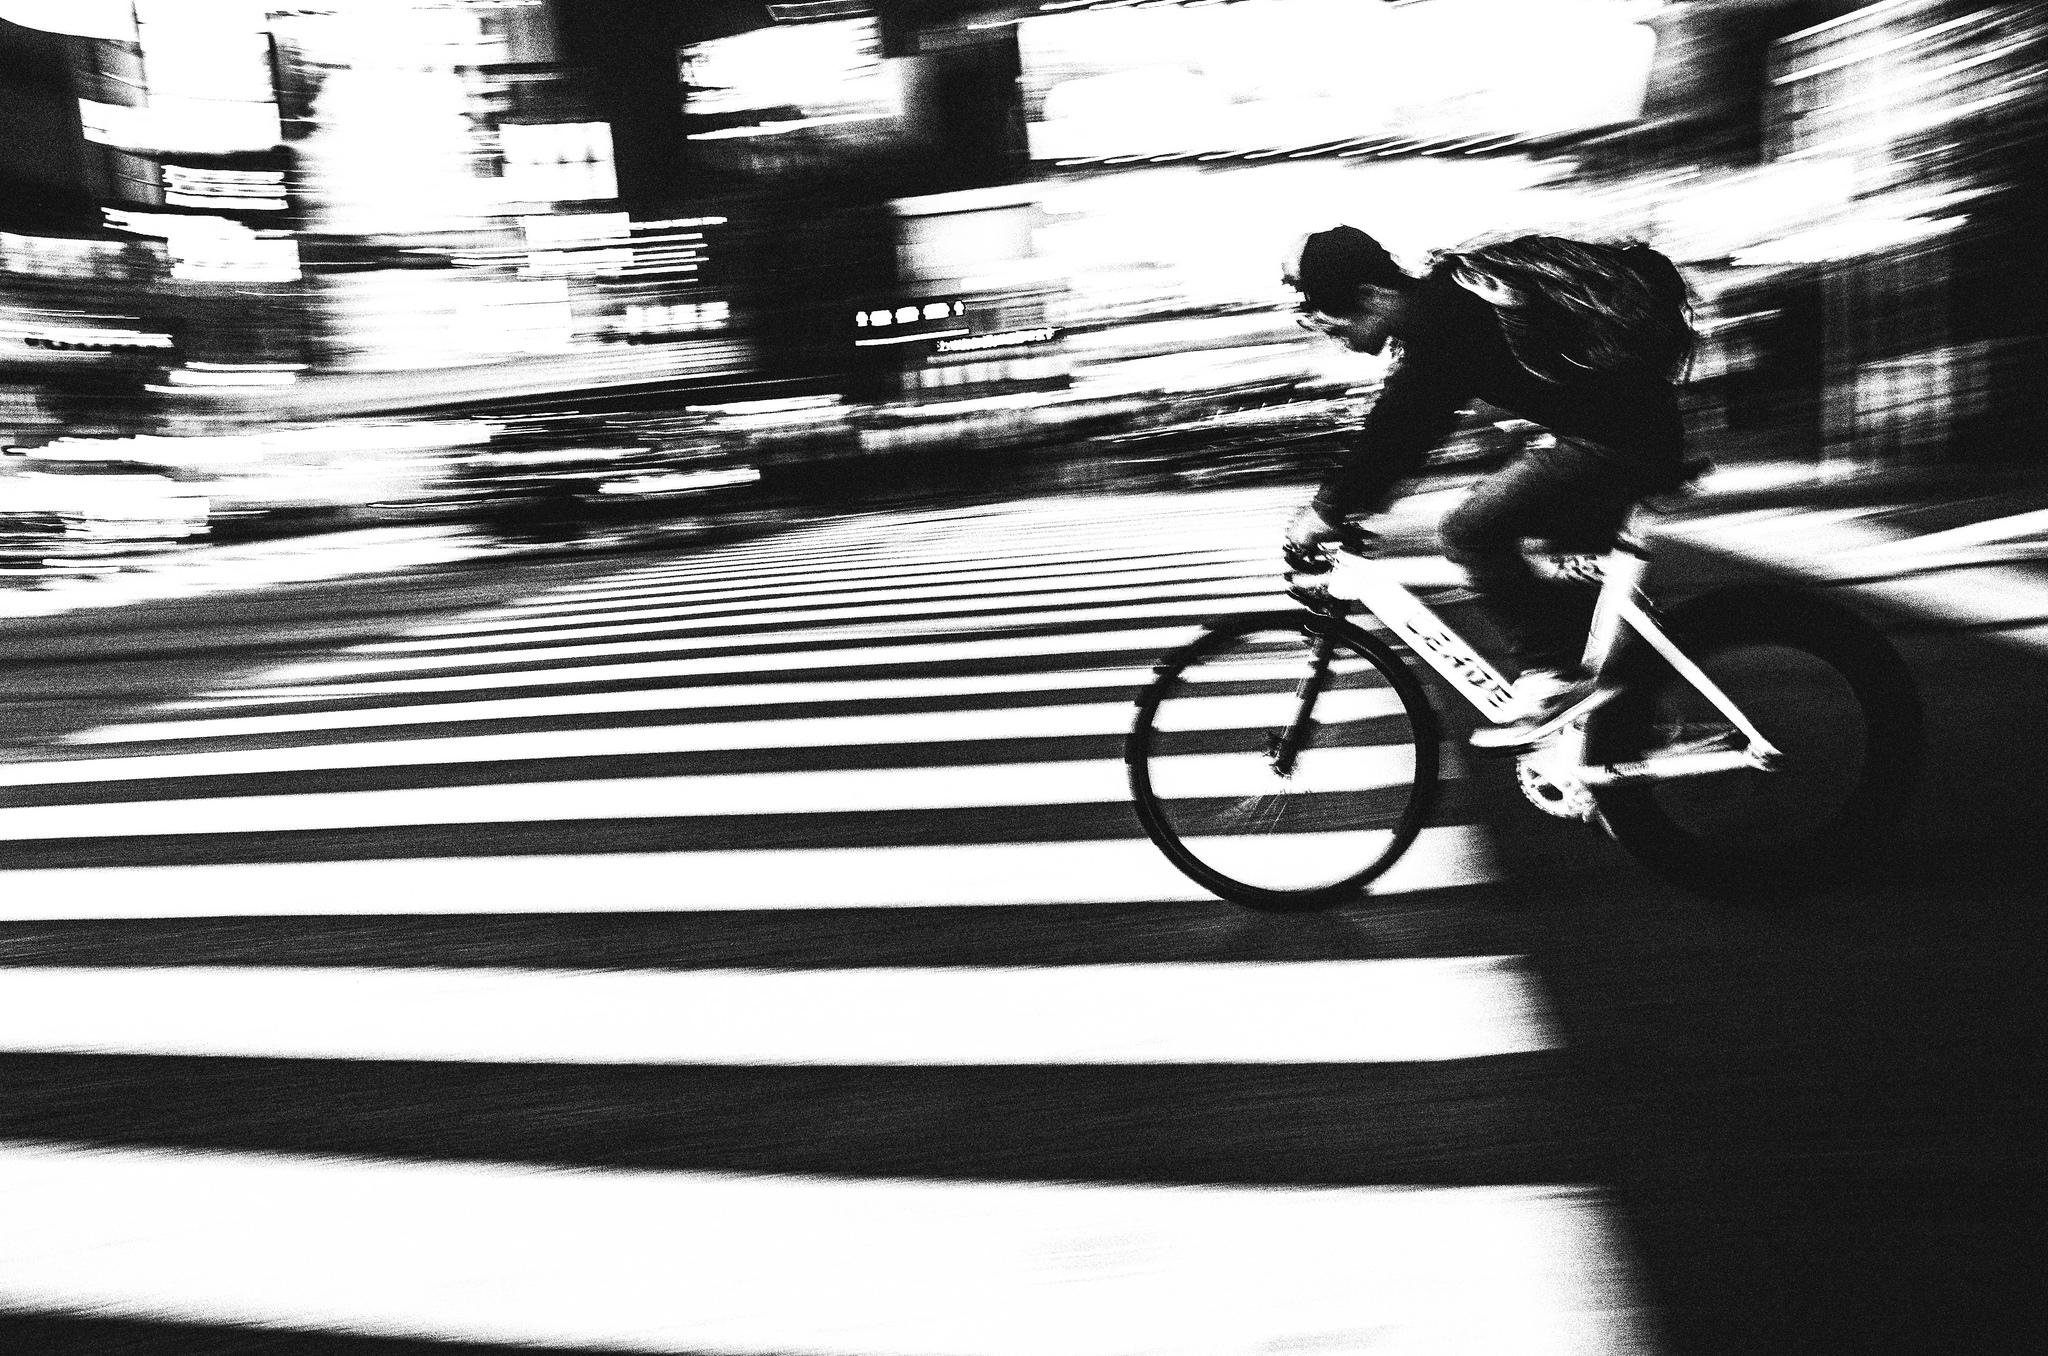 Shibuya: April, 2016 (Black and white)